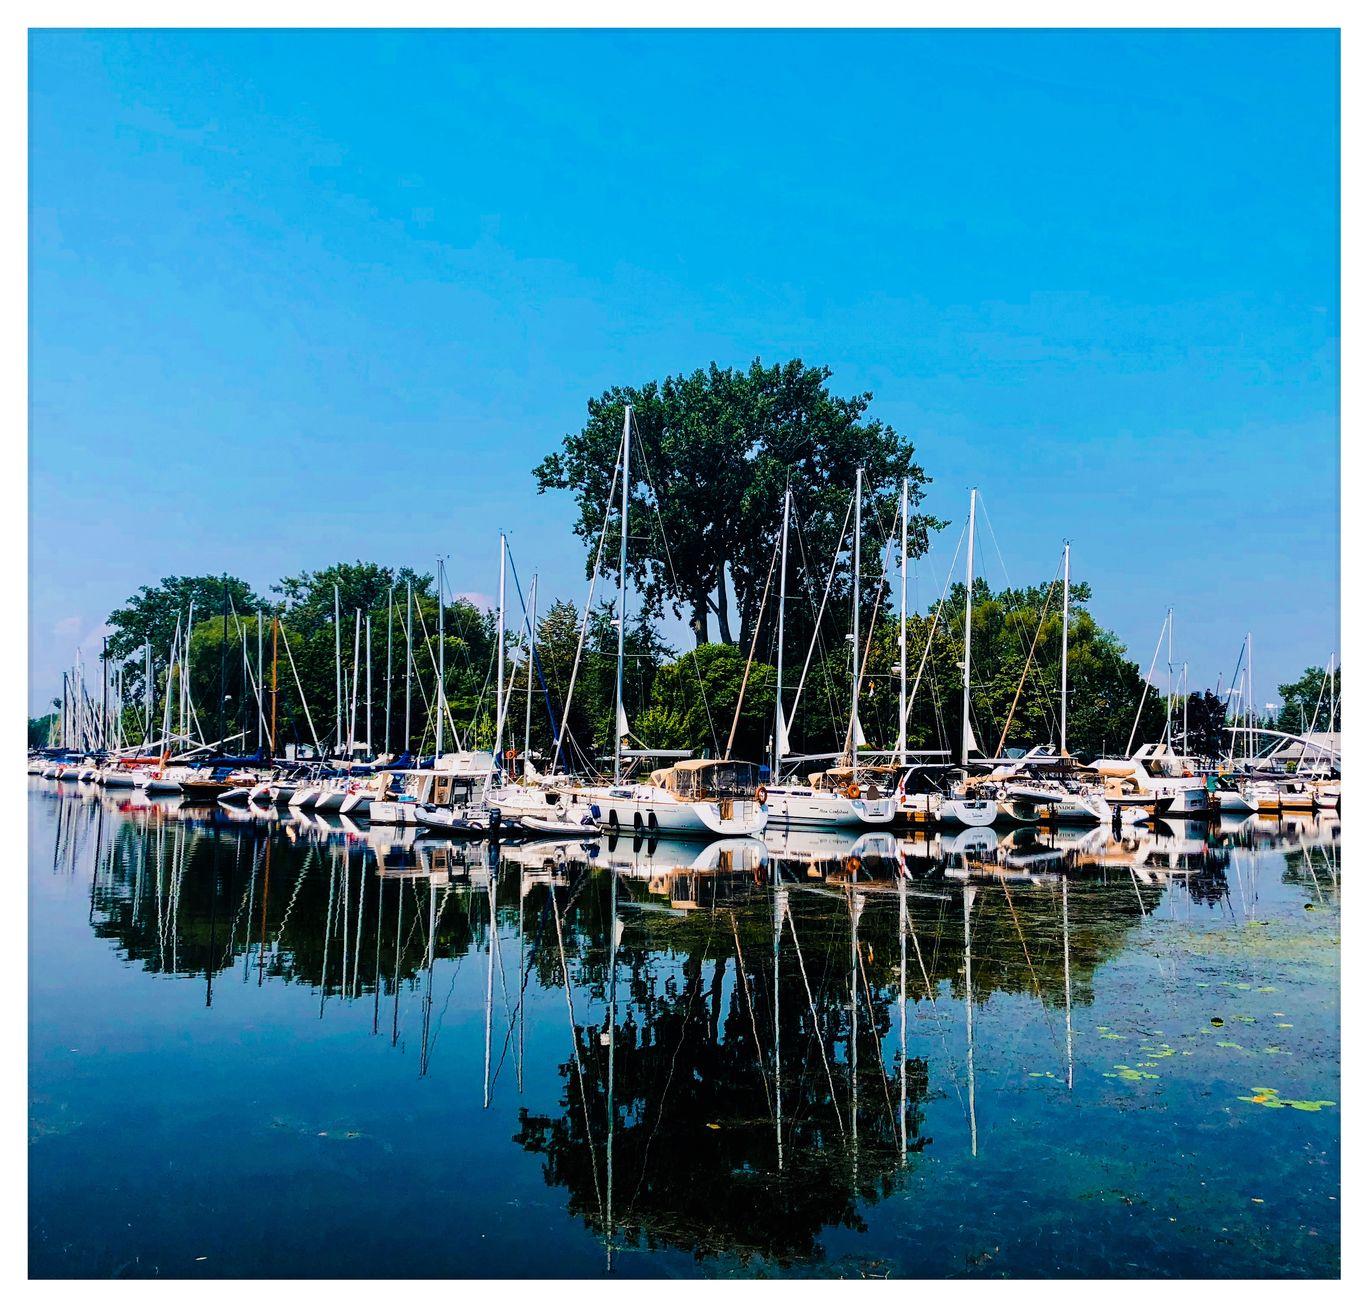 Photo of Toronto Islands By Gauri Sekaria